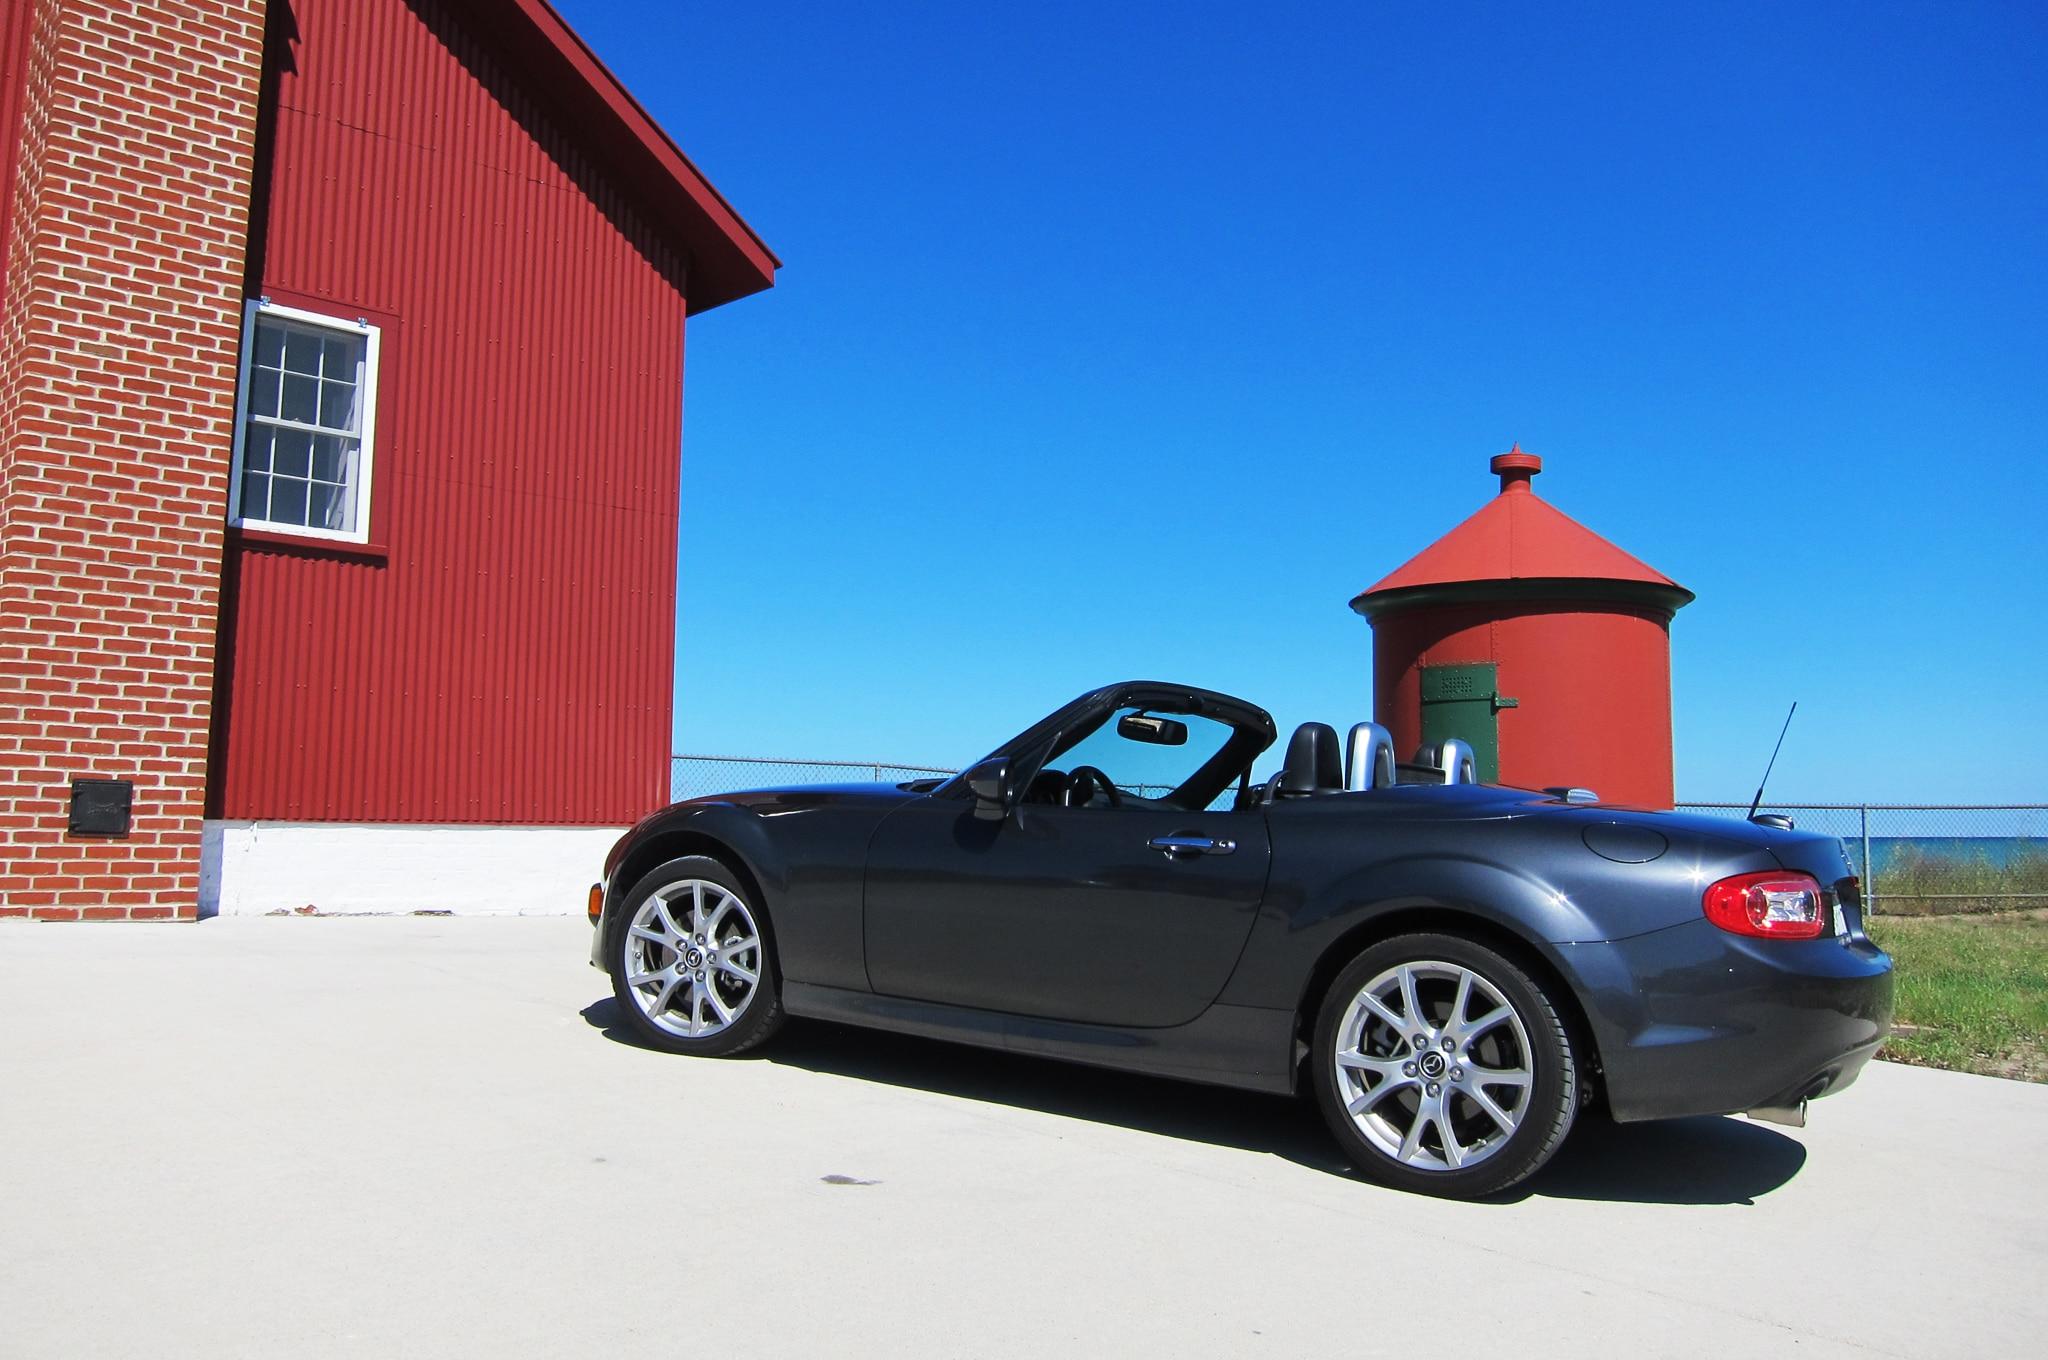 2014 Mazda Mx 5 Miata 05 Lighthouse Profile